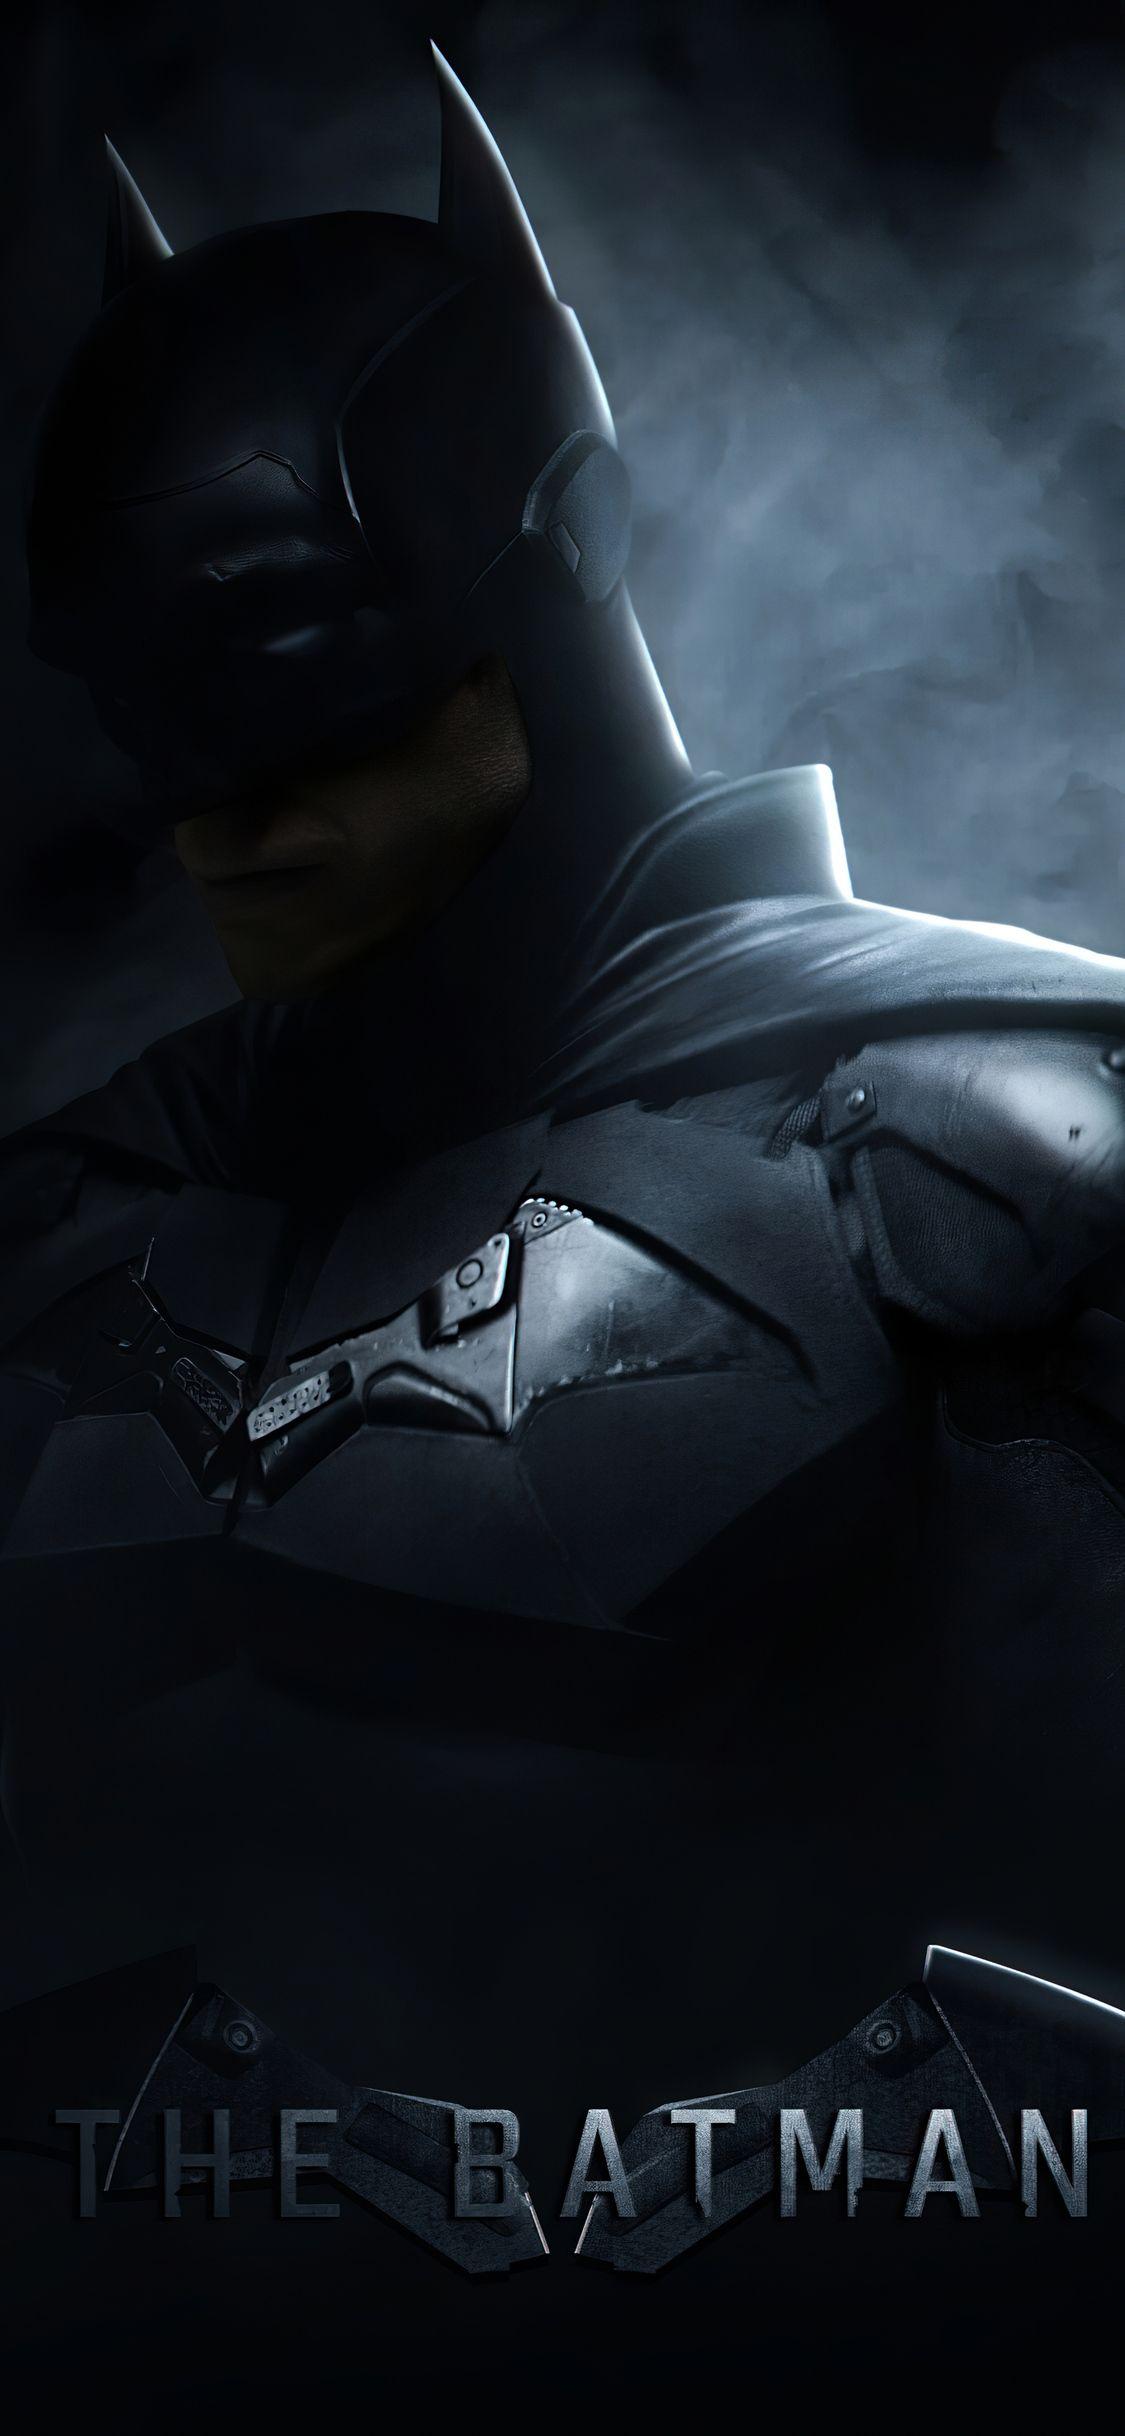 Batman 2021 Wallpapers   Top Batman 2021 Backgrounds 1125x2436